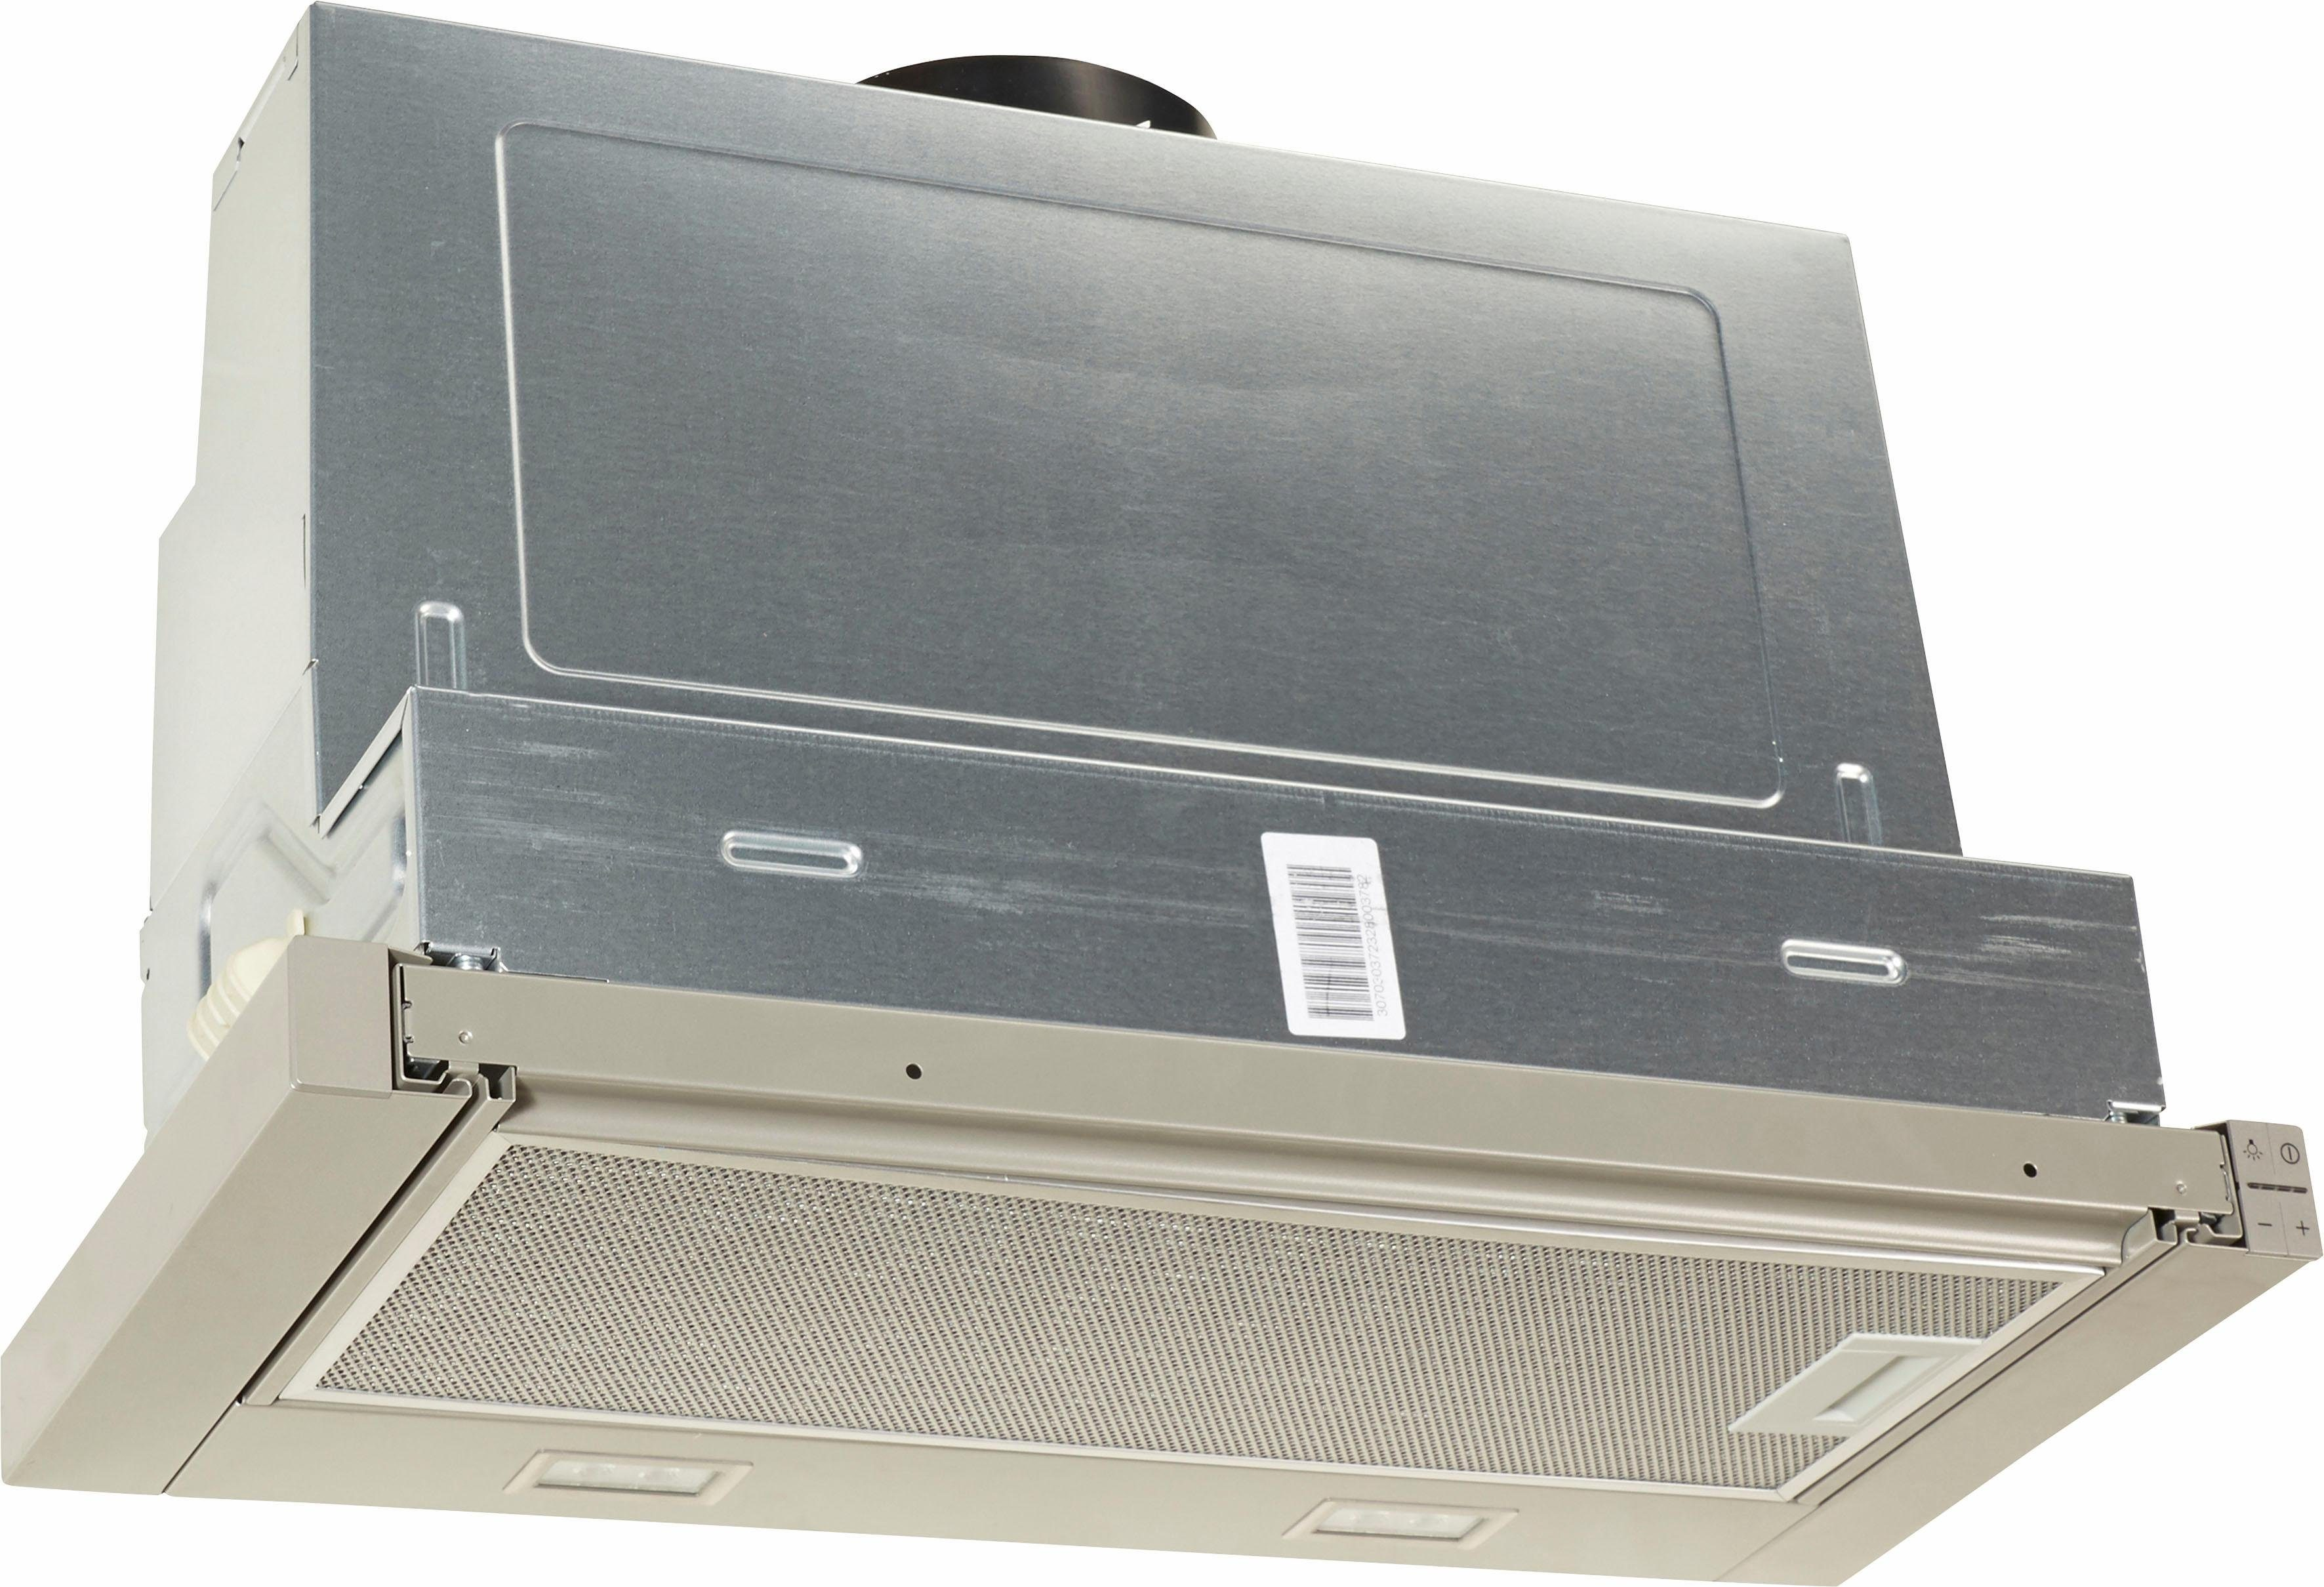 "Siemens Flachschirmhaube iQ300 ""LI67RA530"", A"